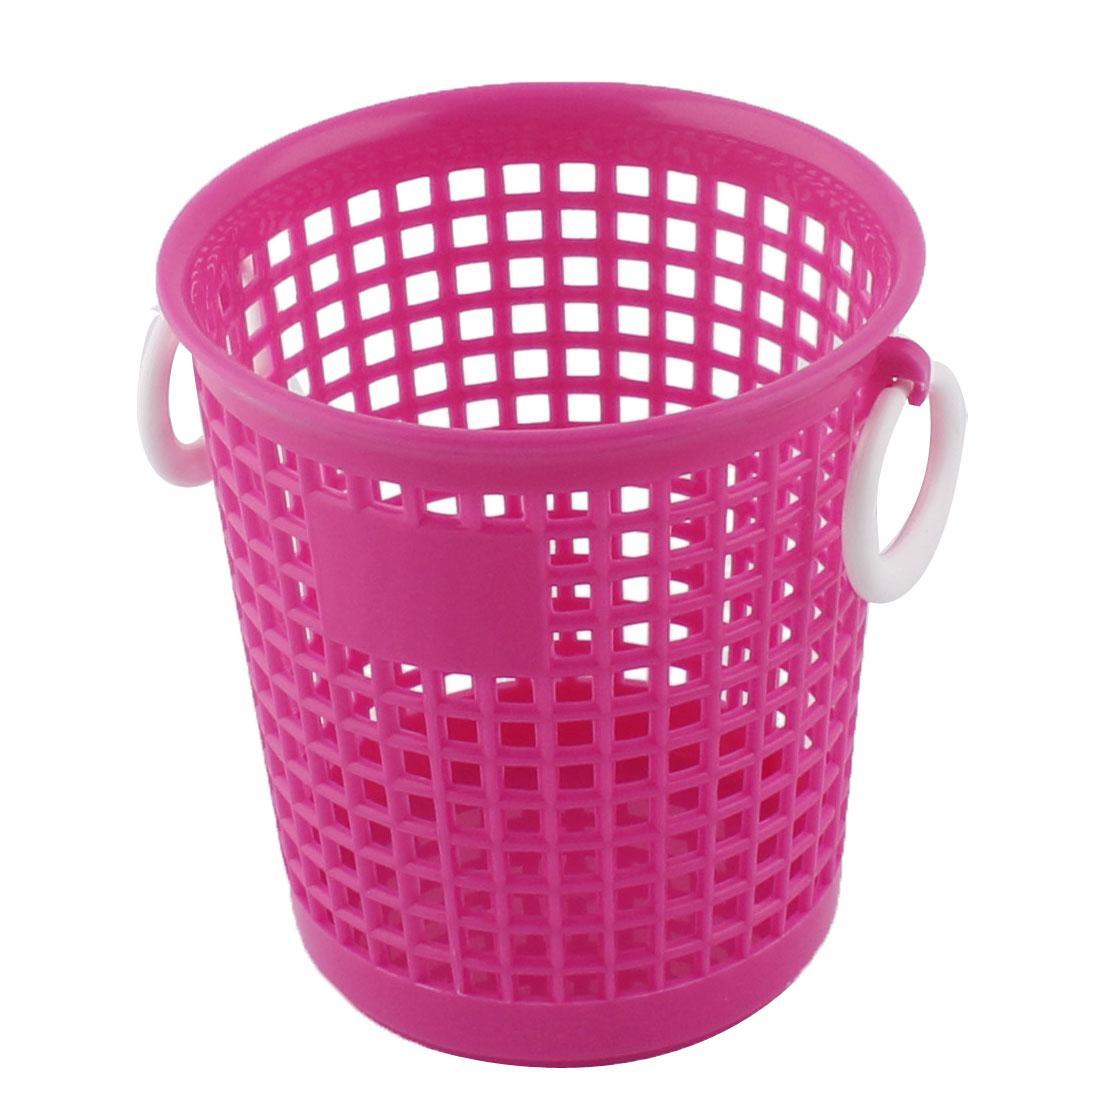 Household Plastic Cylindrical Shape Storage Sundries Organizer Basket Box Fuchsia